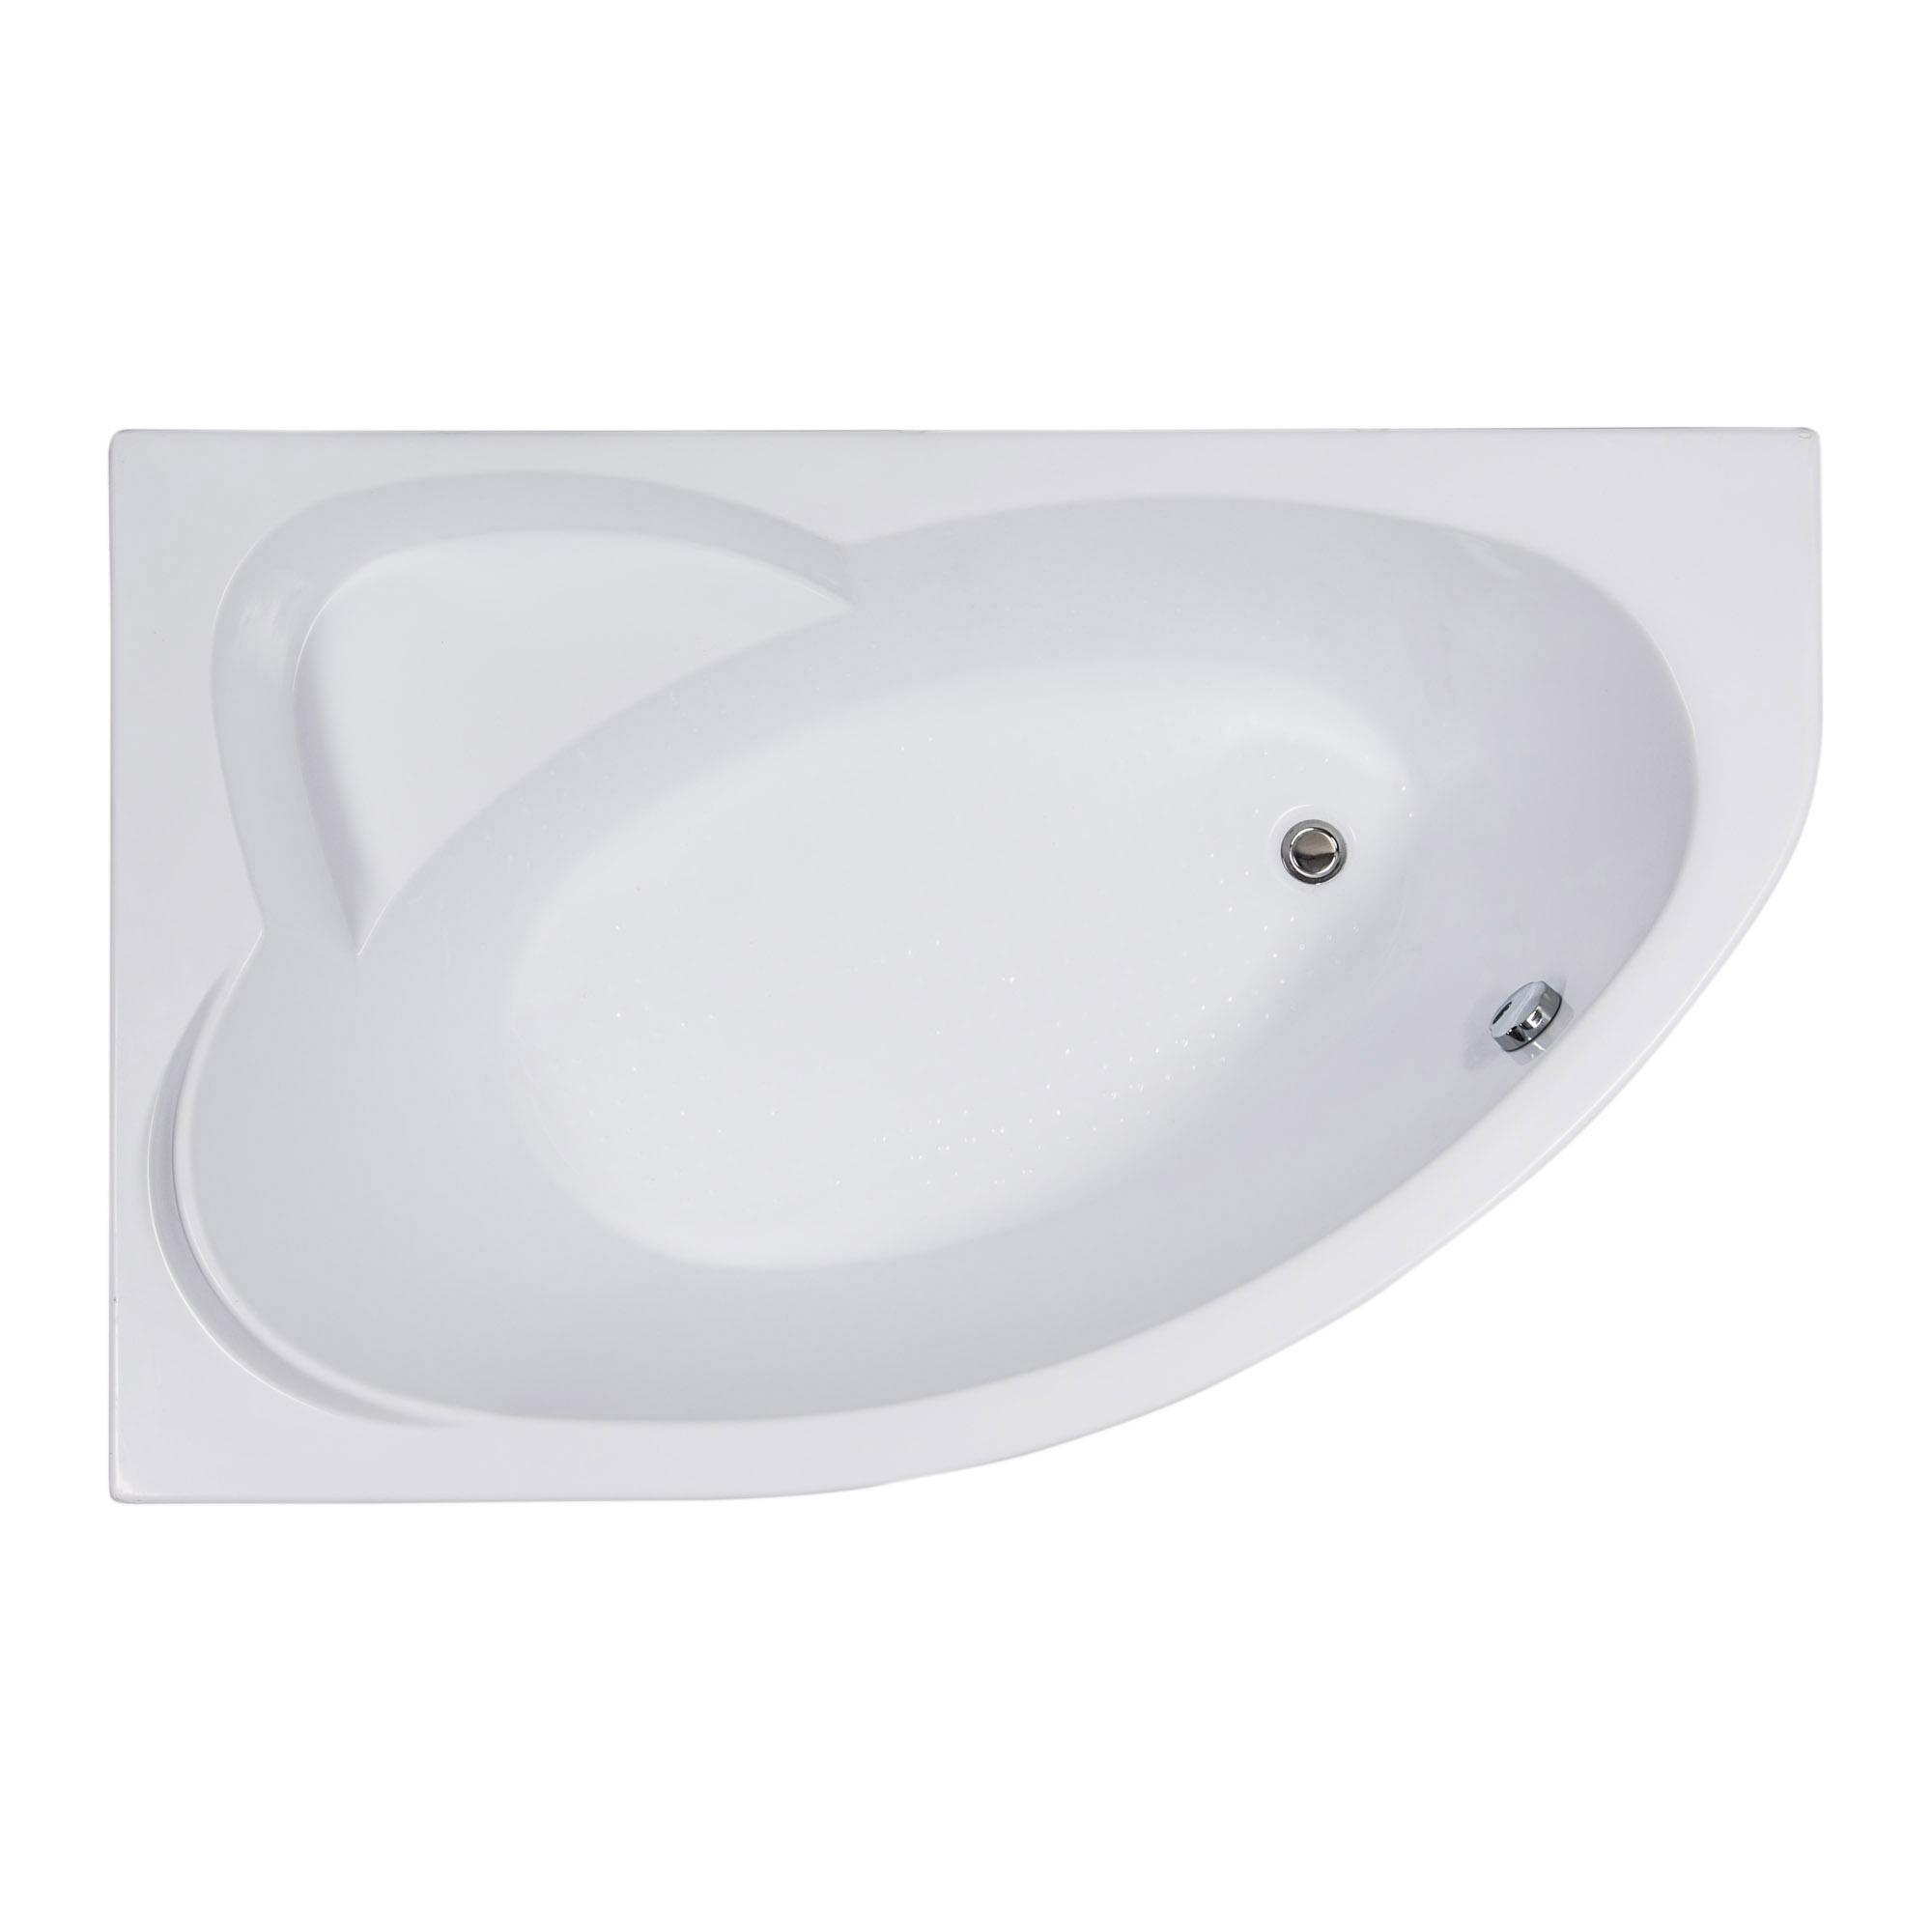 Акриловая ванна Aquanet Sarezo 160x100 L без гидромассажа недорого